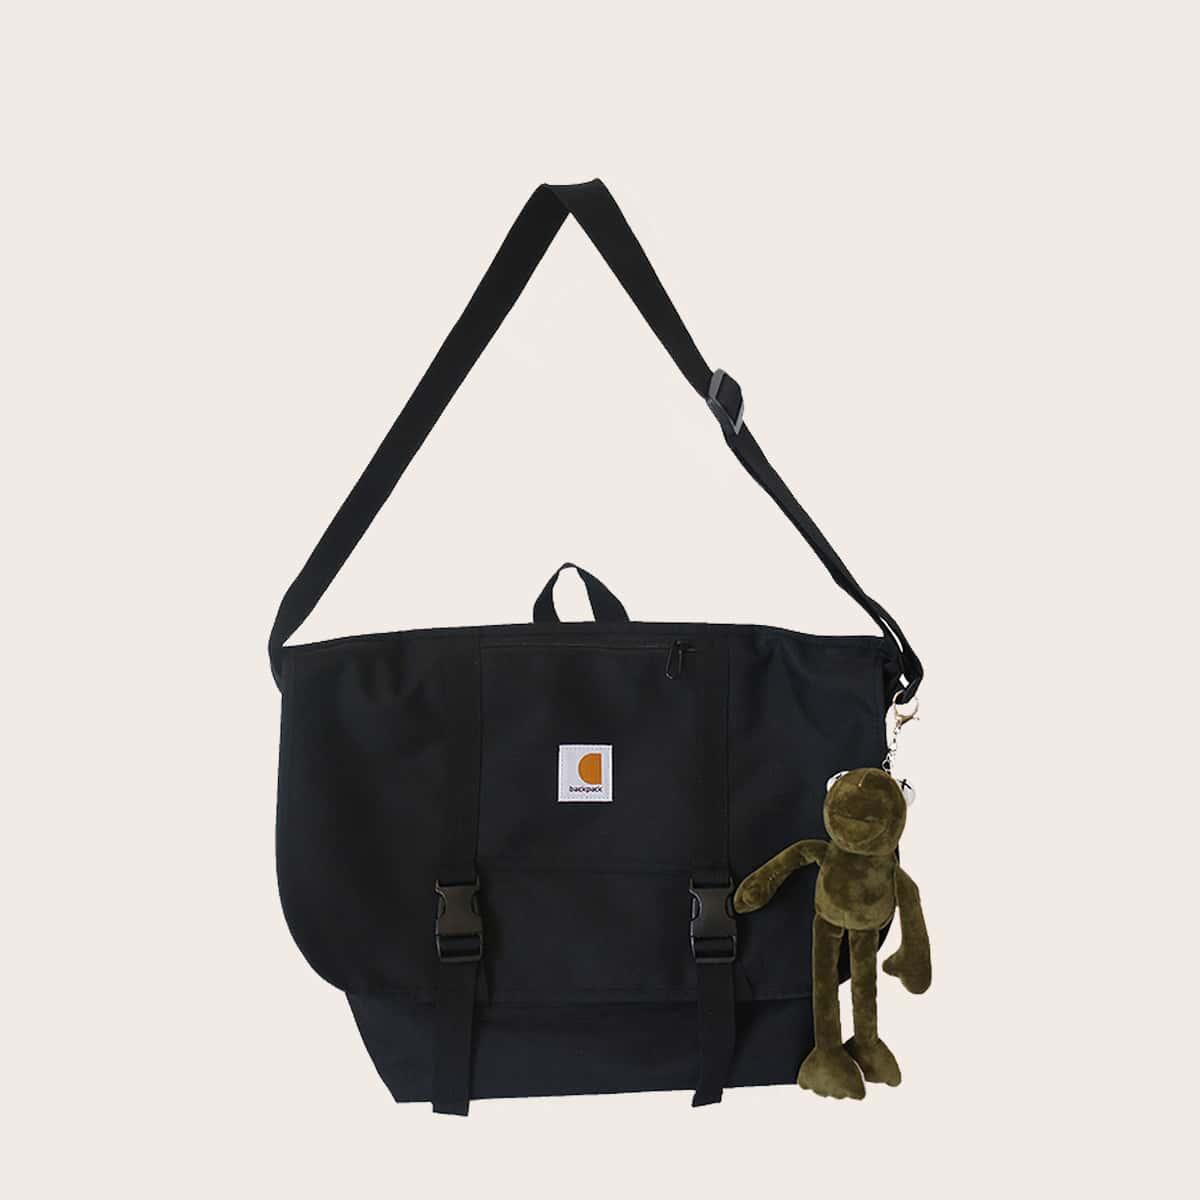 shein Mannen messenger bag met gesp en tas charme